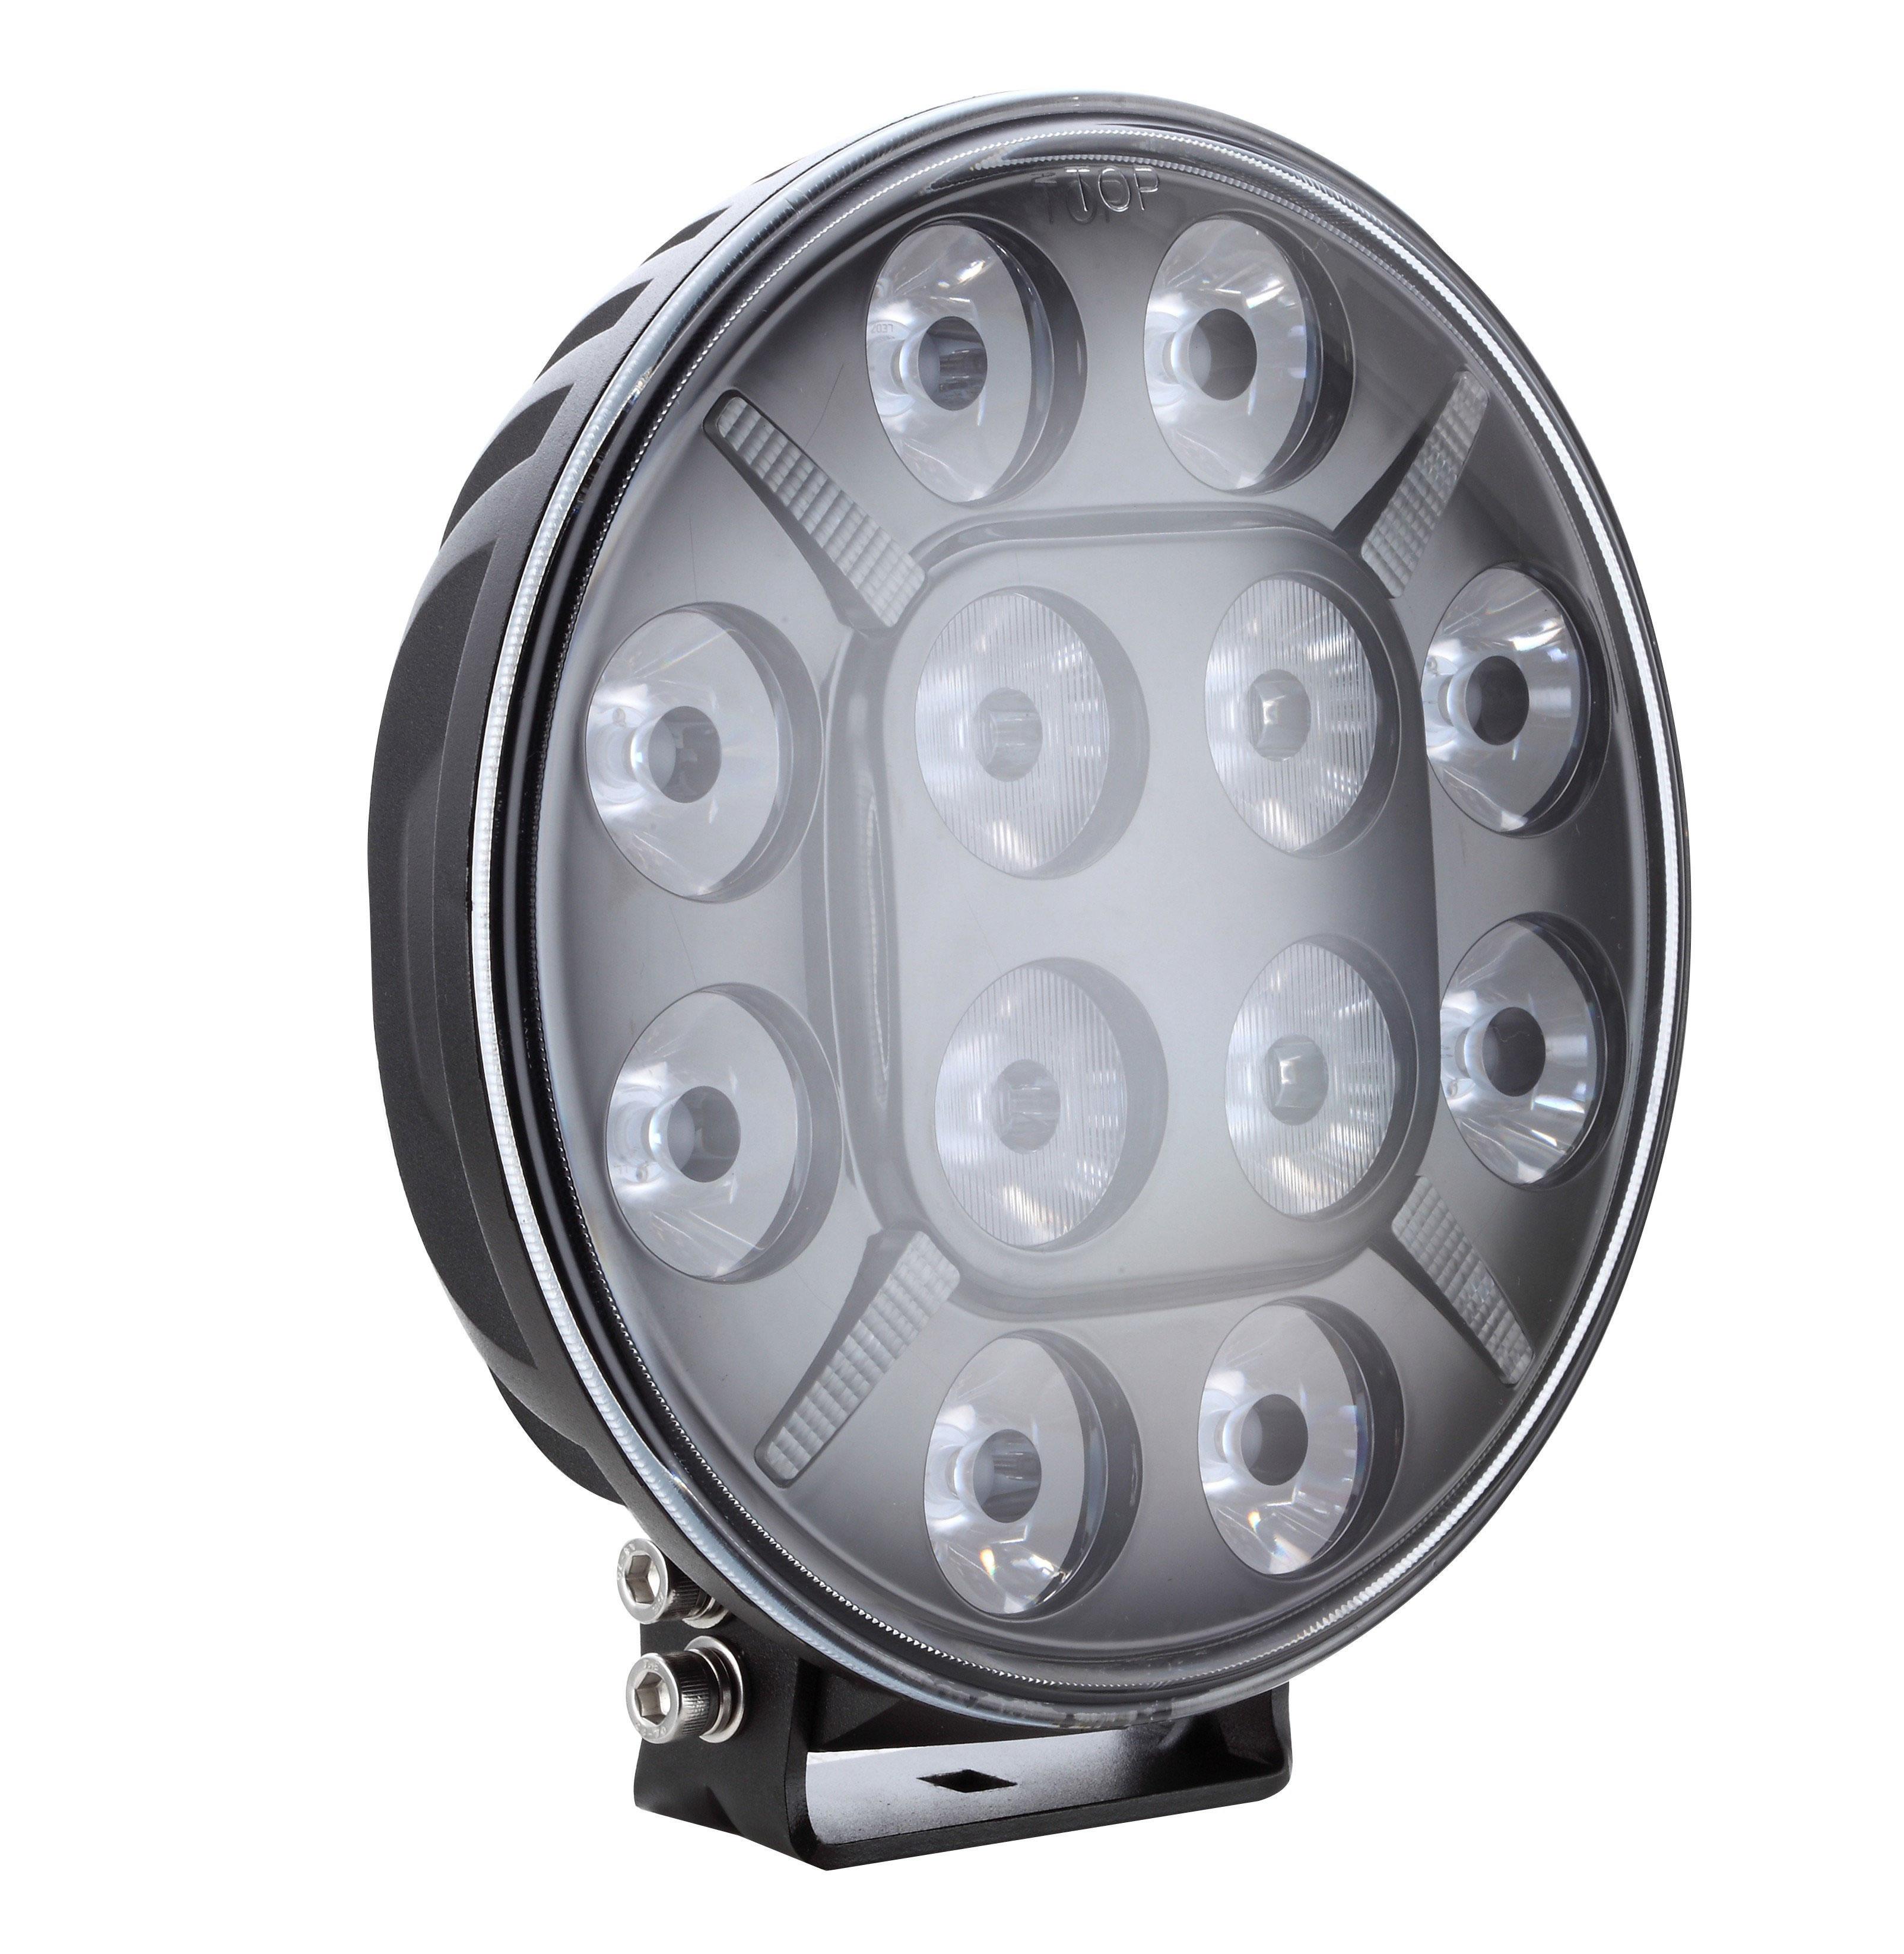 "LED Extraljus 7"" 60W Parkeringsljus E-godkänd"